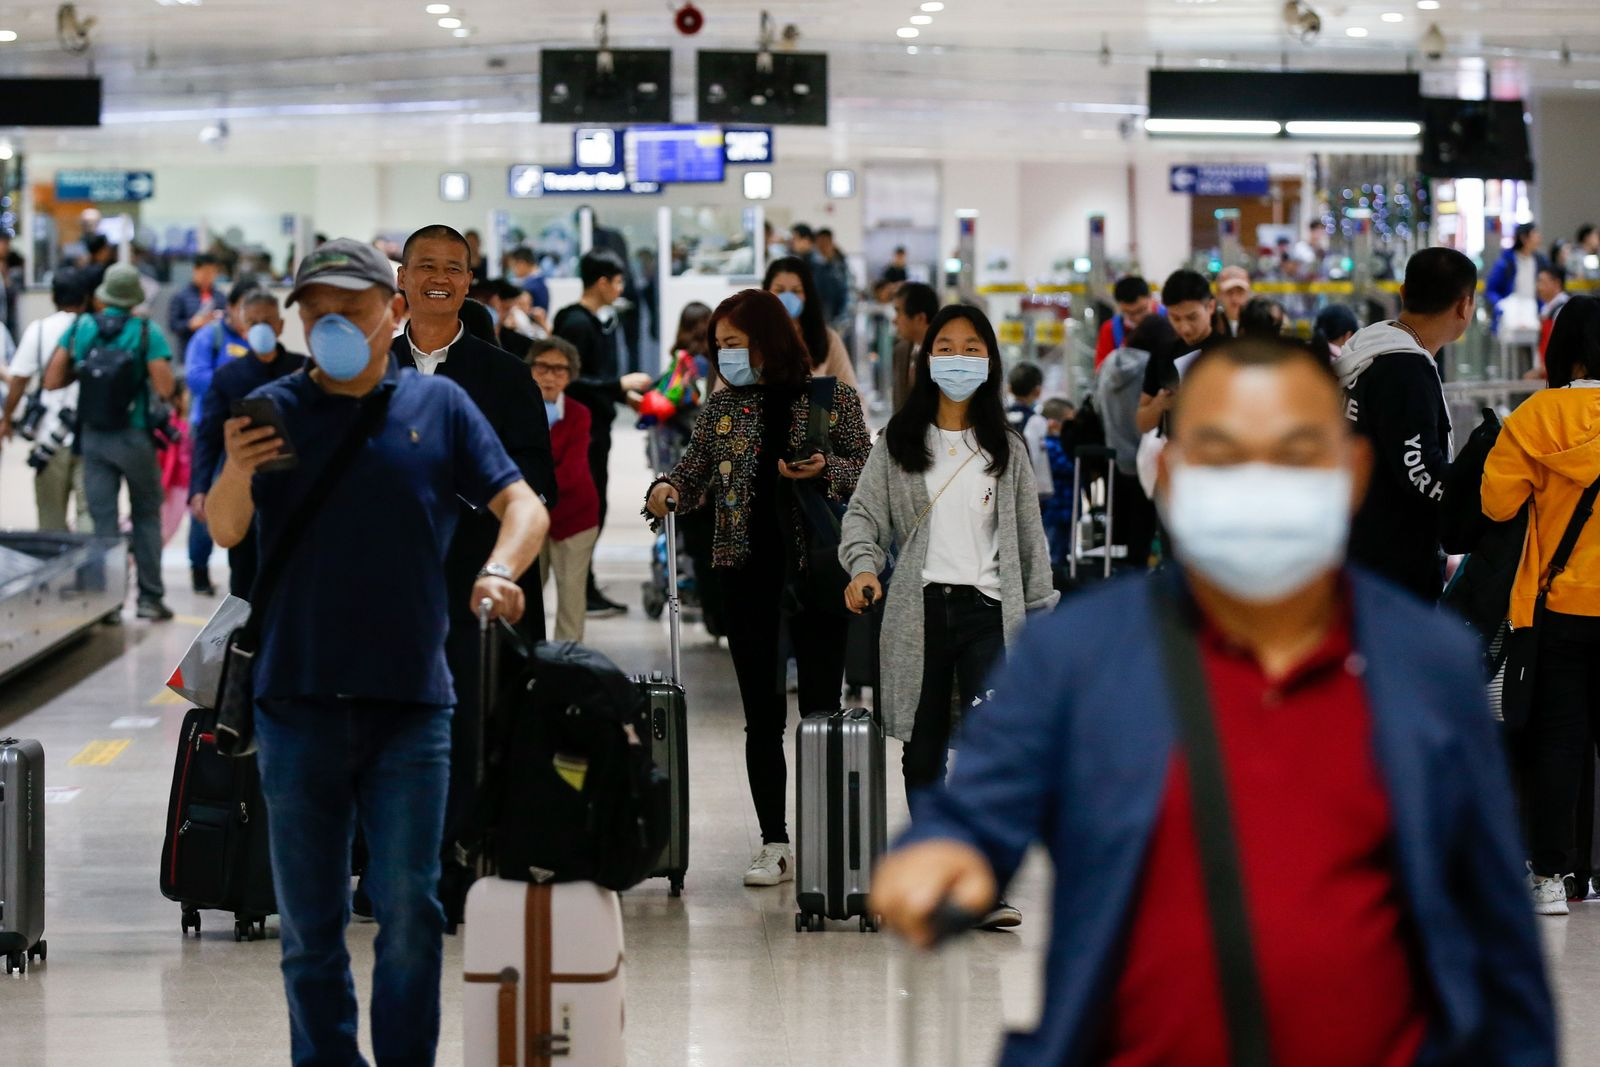 Coronavirus security measures at the Manila International Airport in Manila, Philippines - 22 Jan 2020